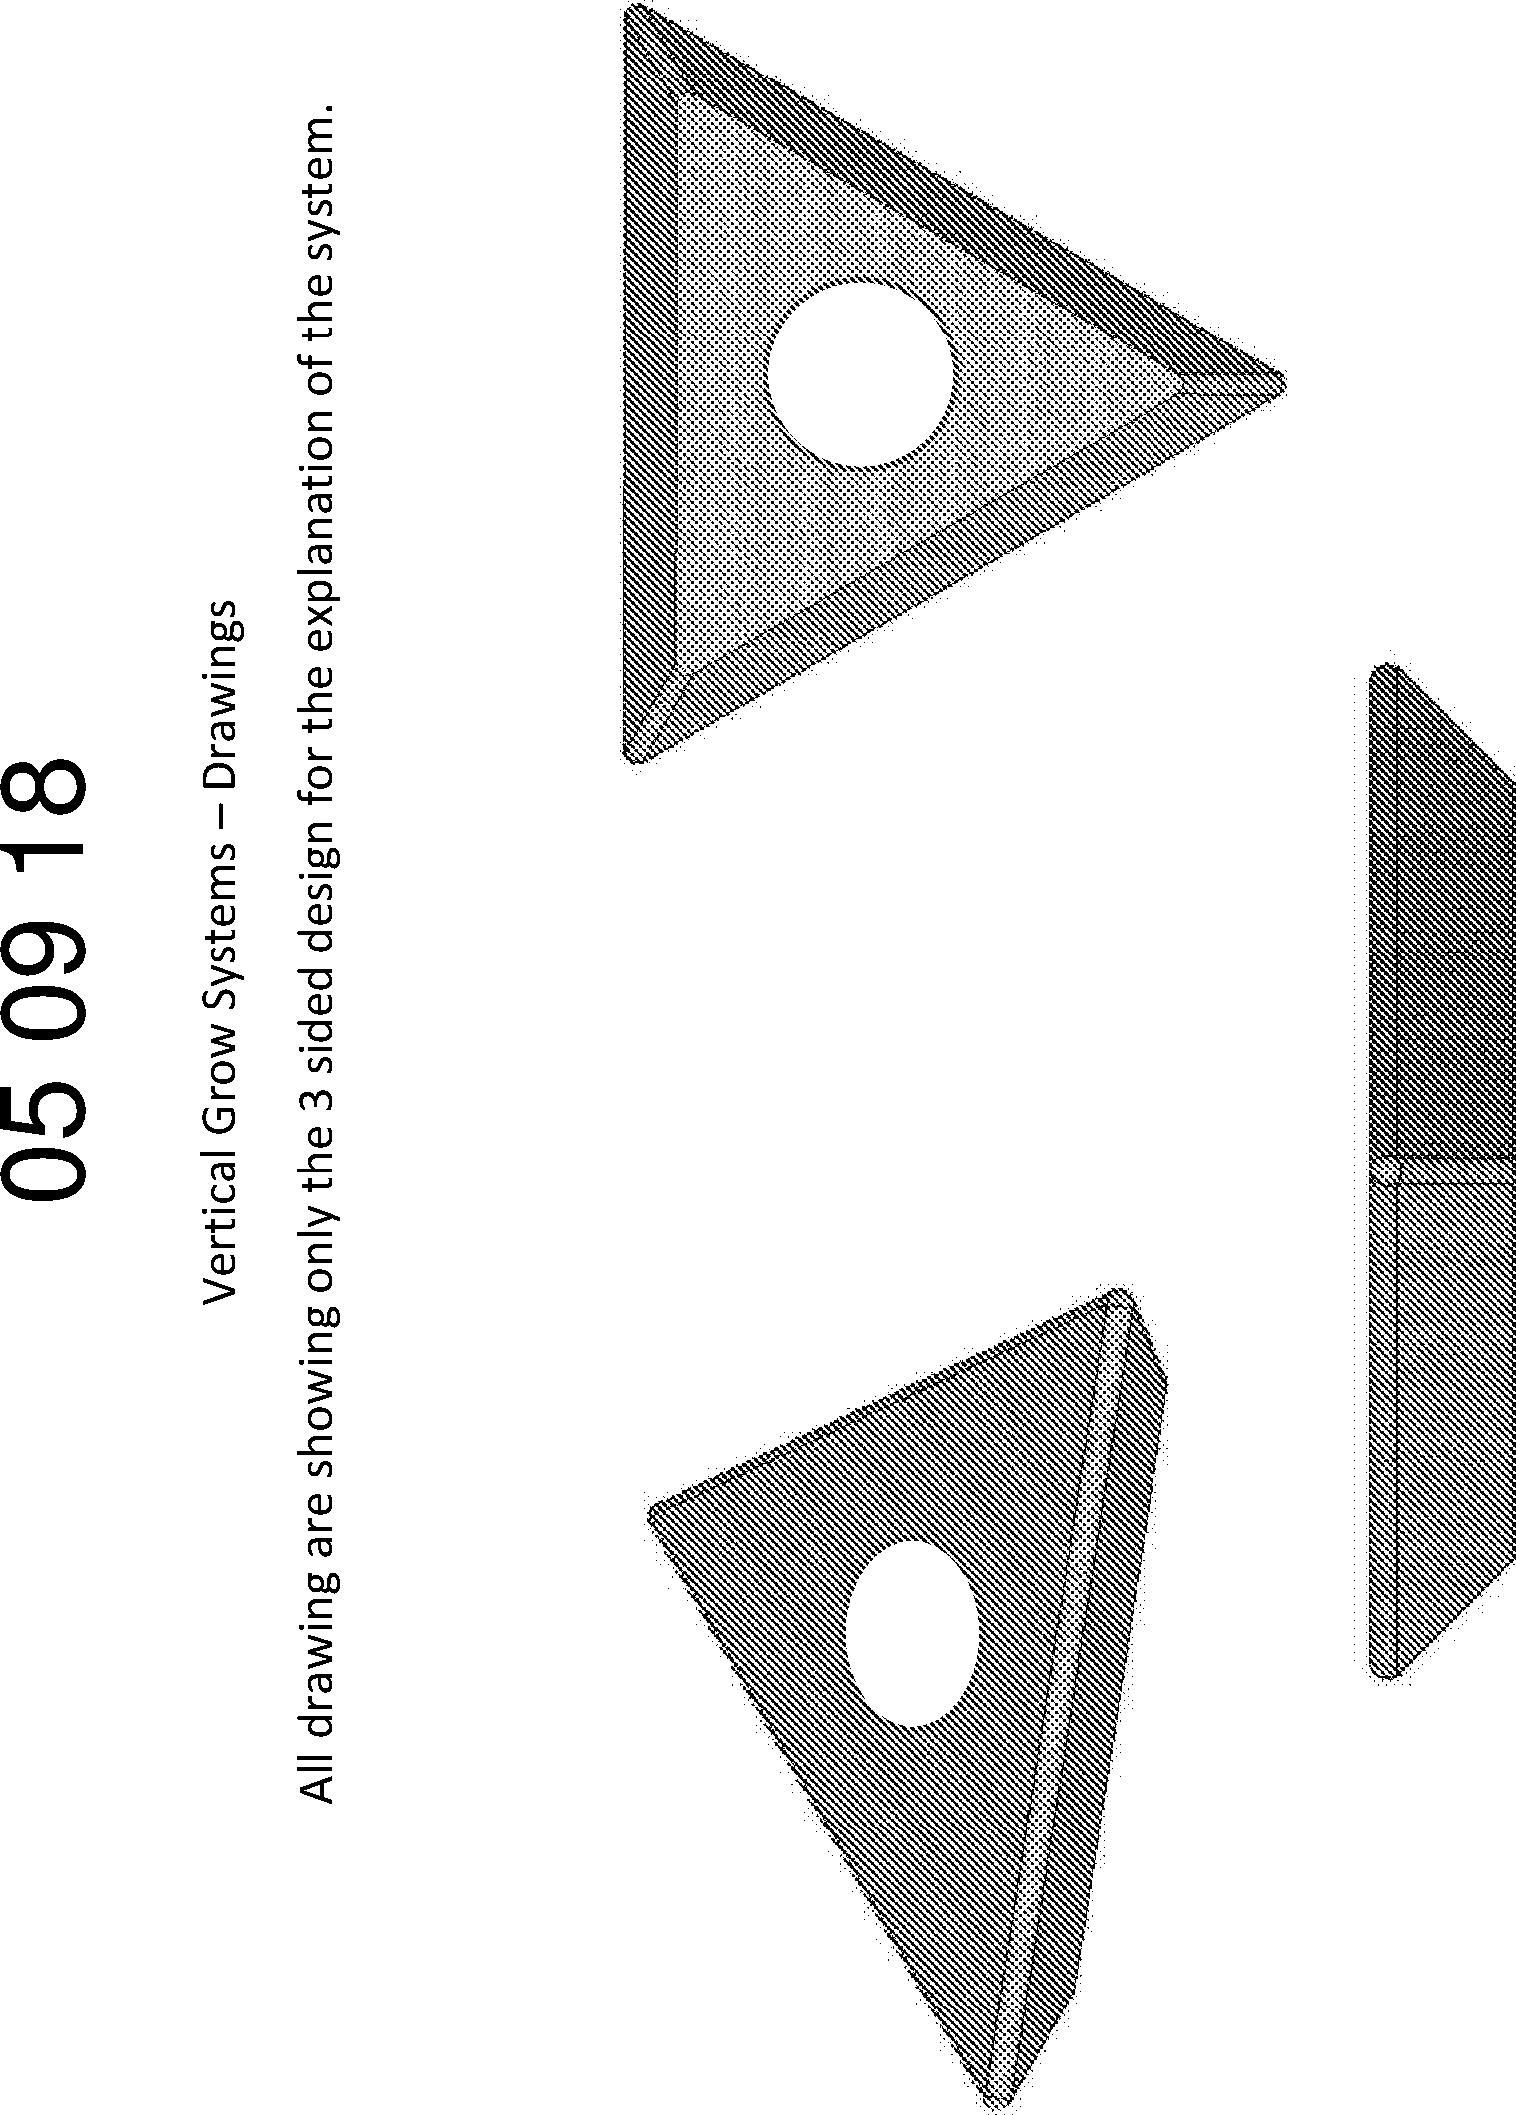 Figure GB2561803A_D0013